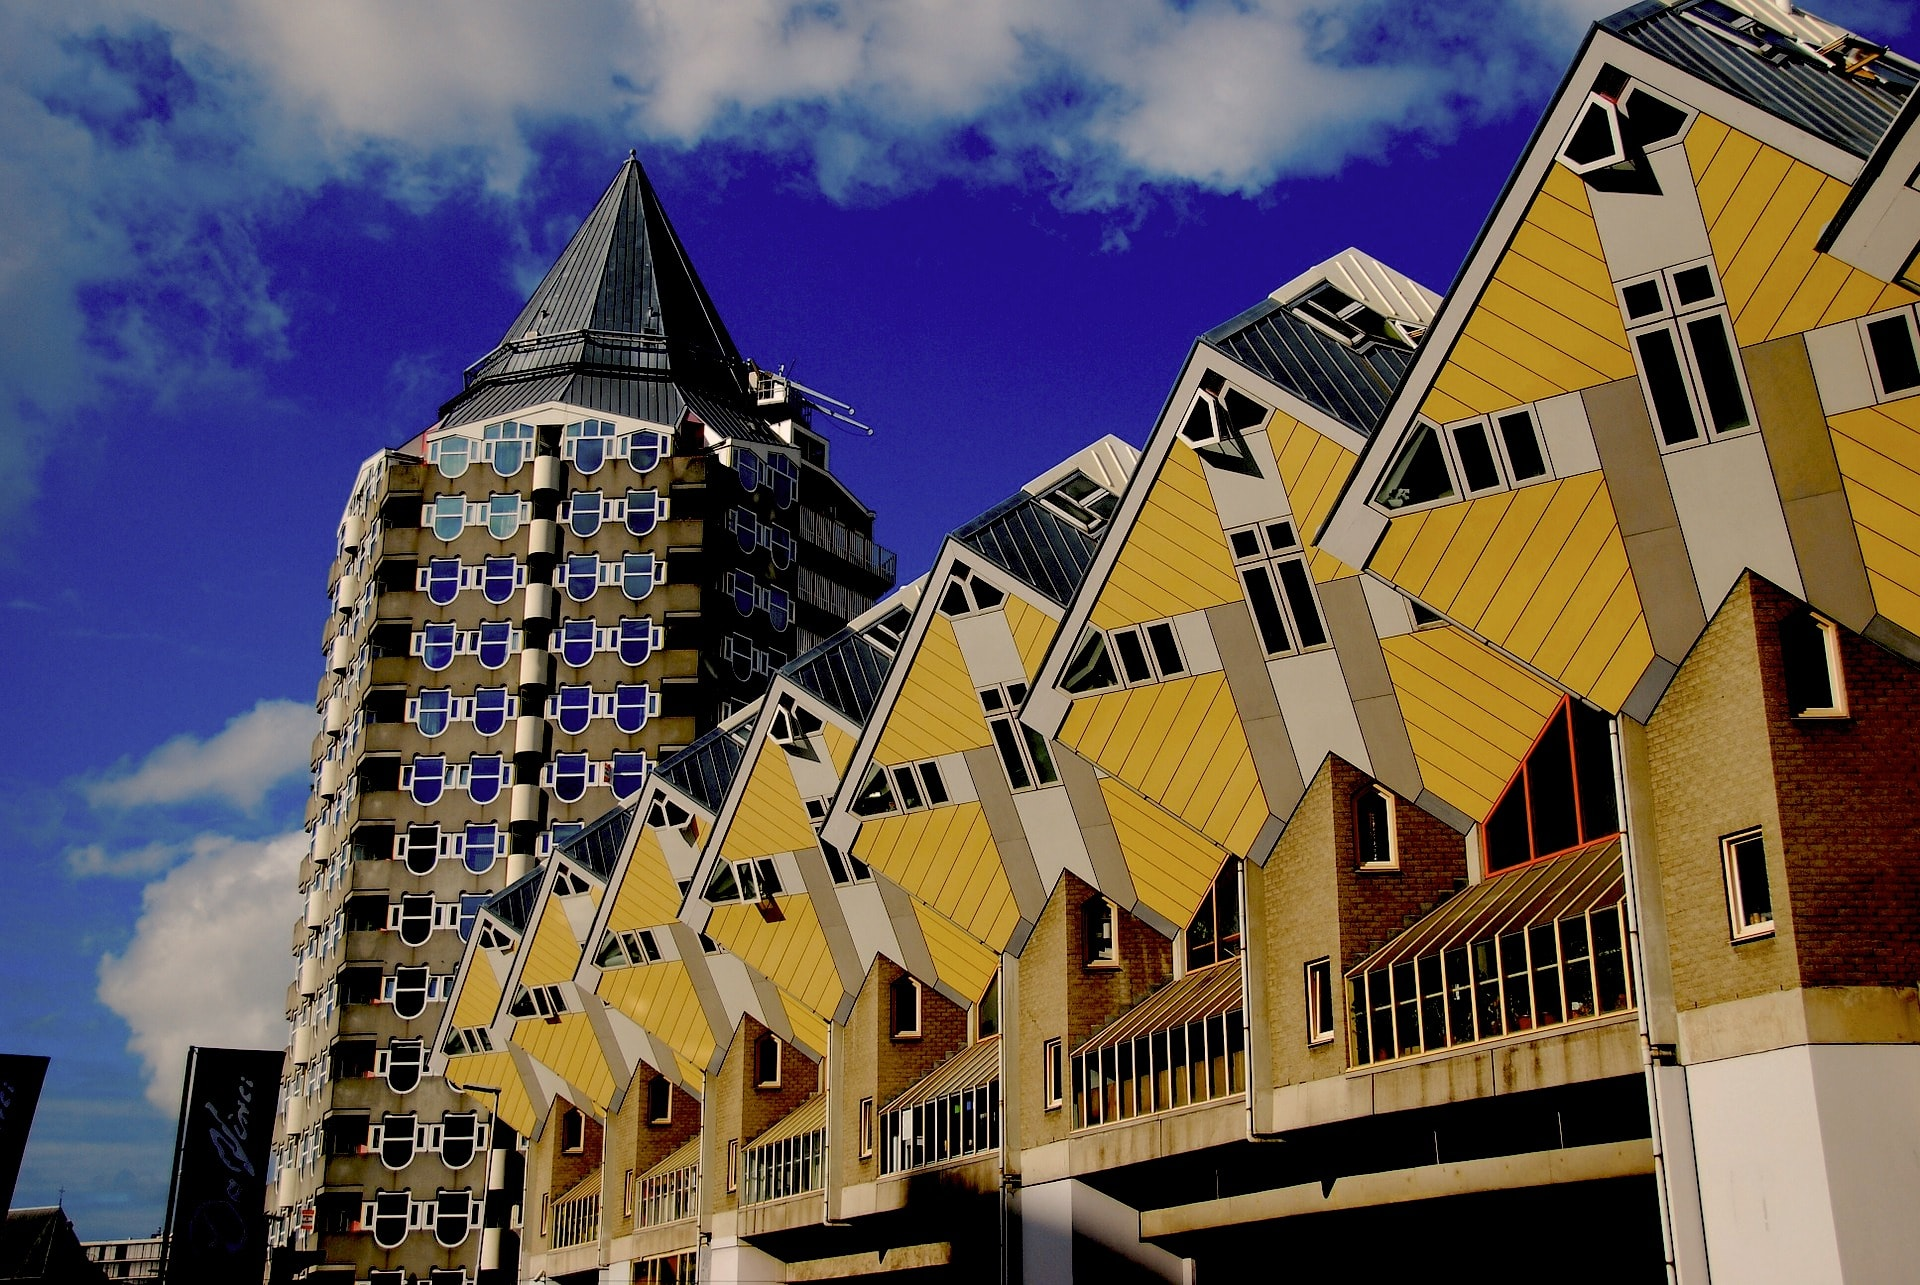 Afkickkliniek Rotterdam